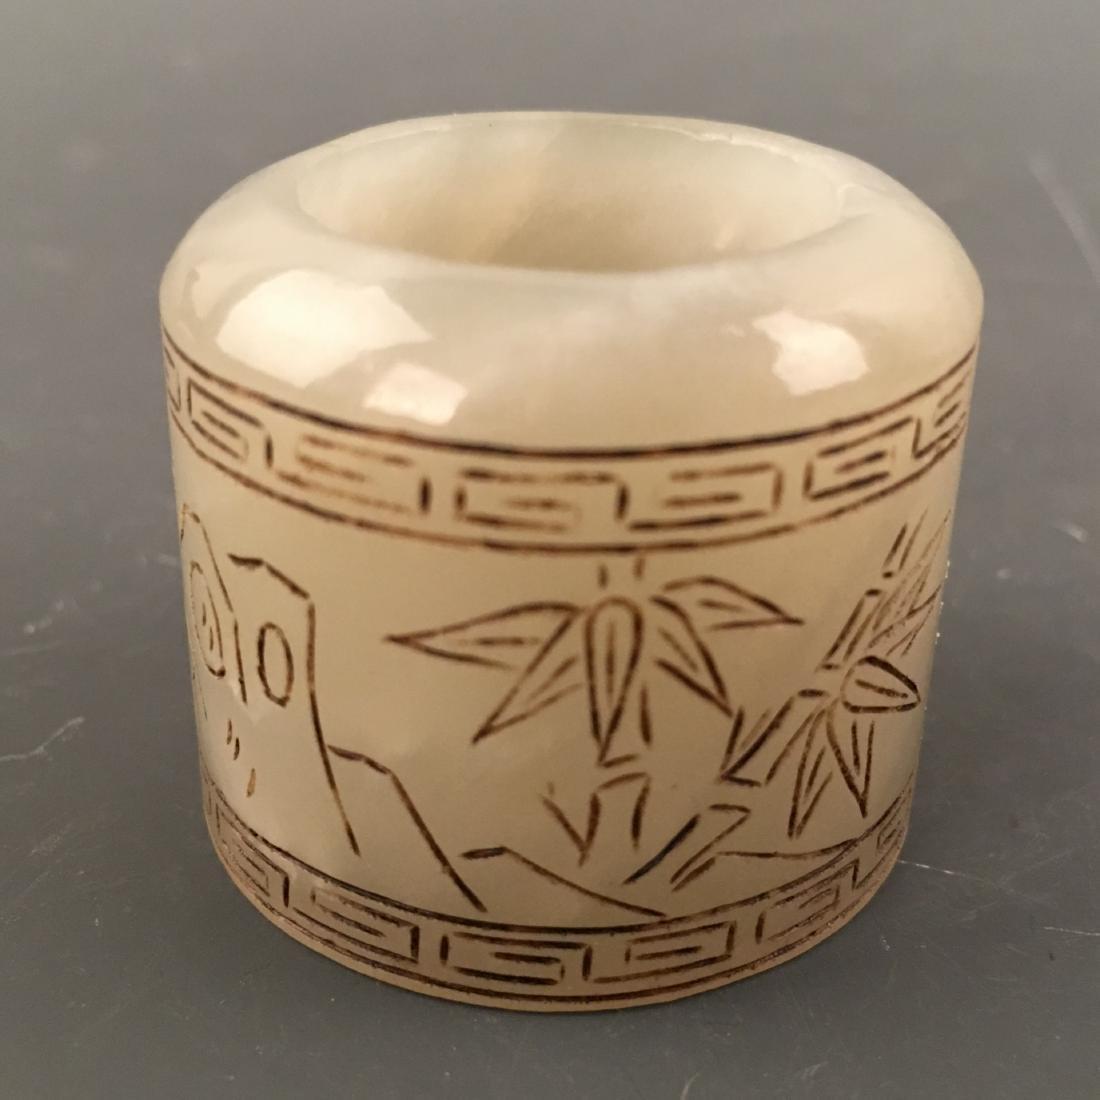 Chinese Archaic 'Bamboo' Jade Thumb Ring